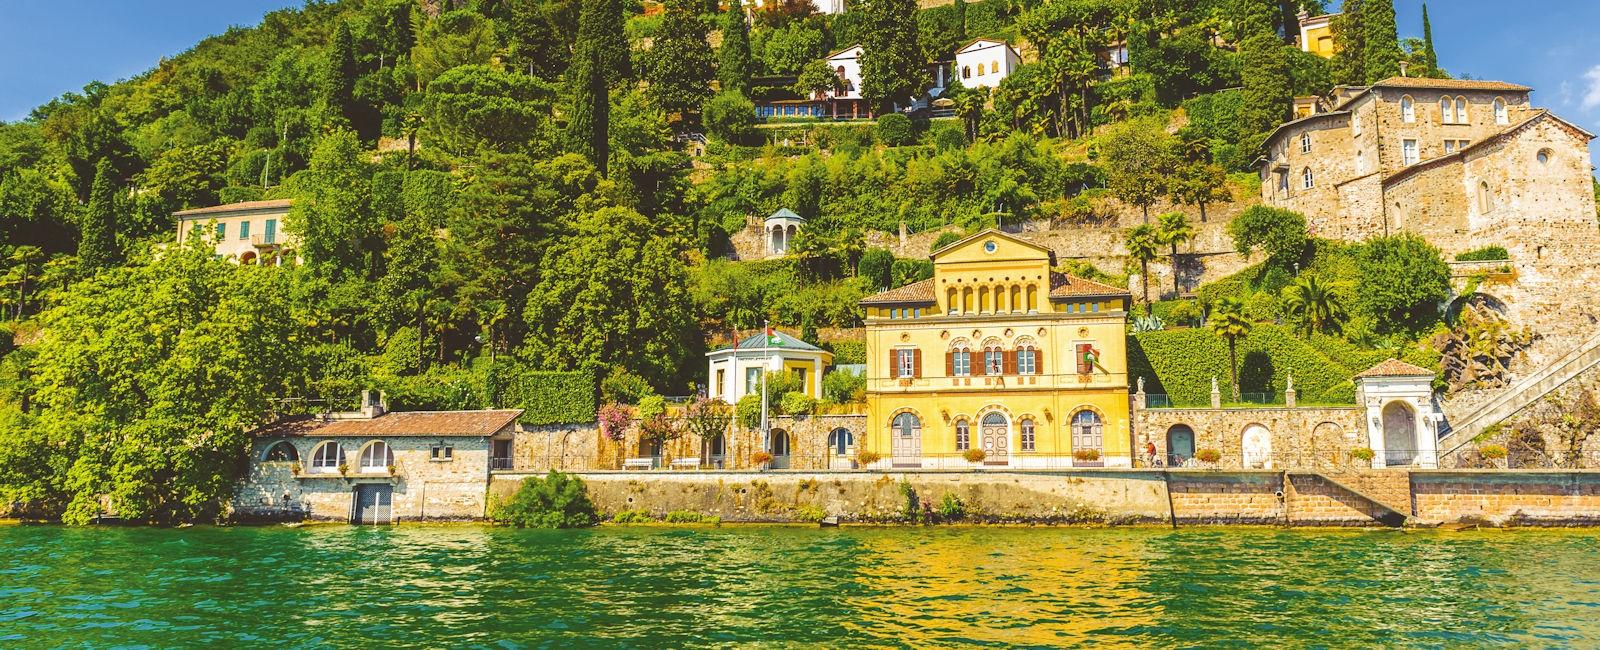 Luxury Lugano holidays